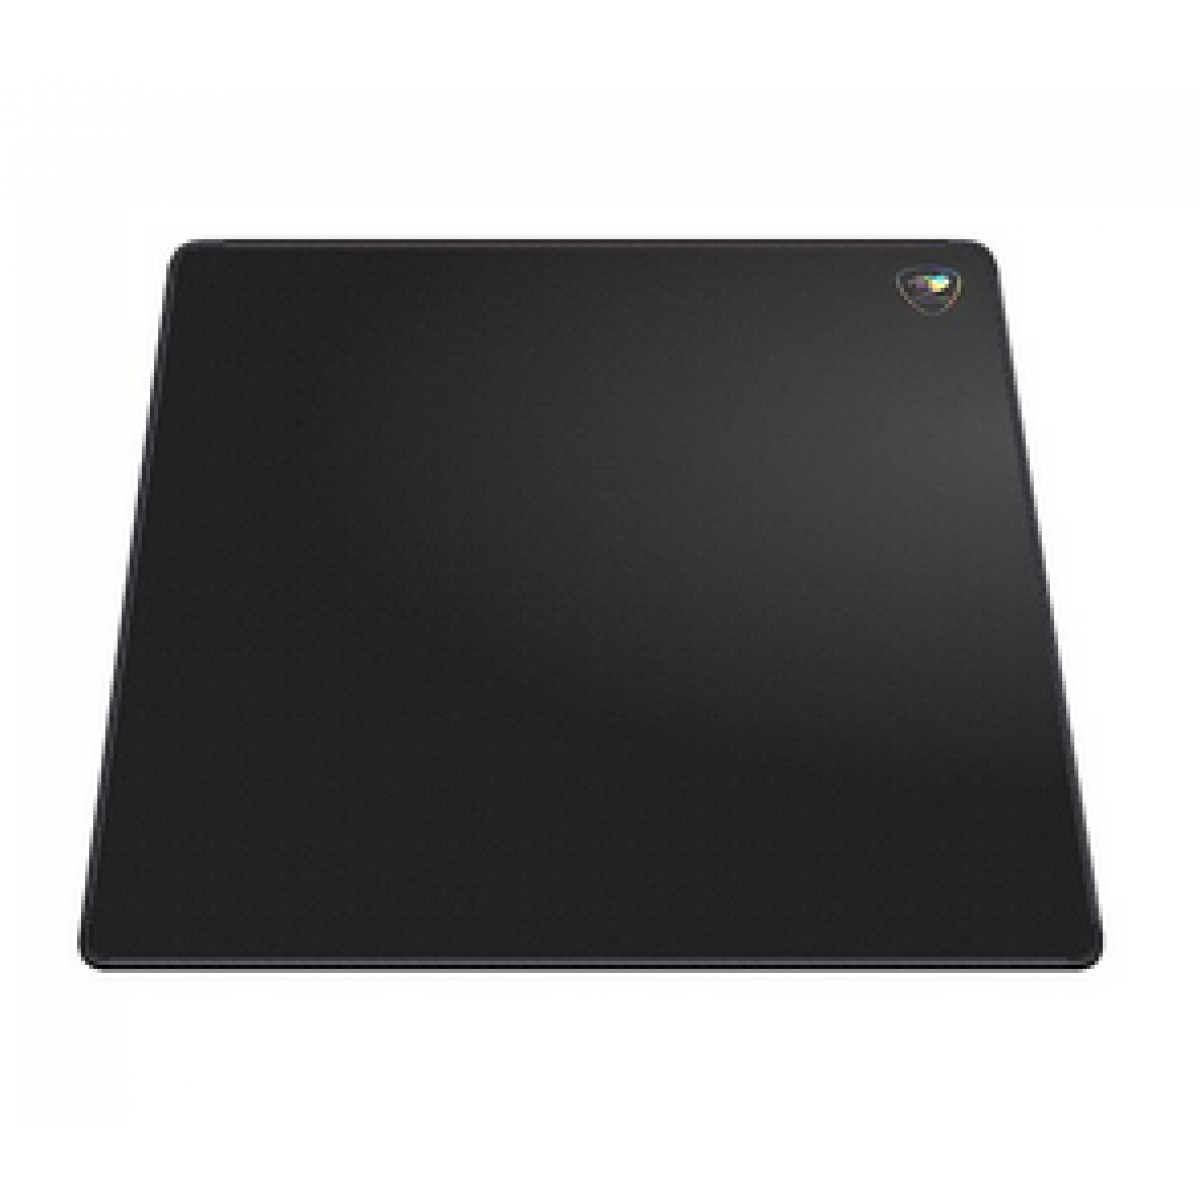 Mousepad Gamer Cougar Speed EX-L, Grande, Black, 3MSPDNNL.0001